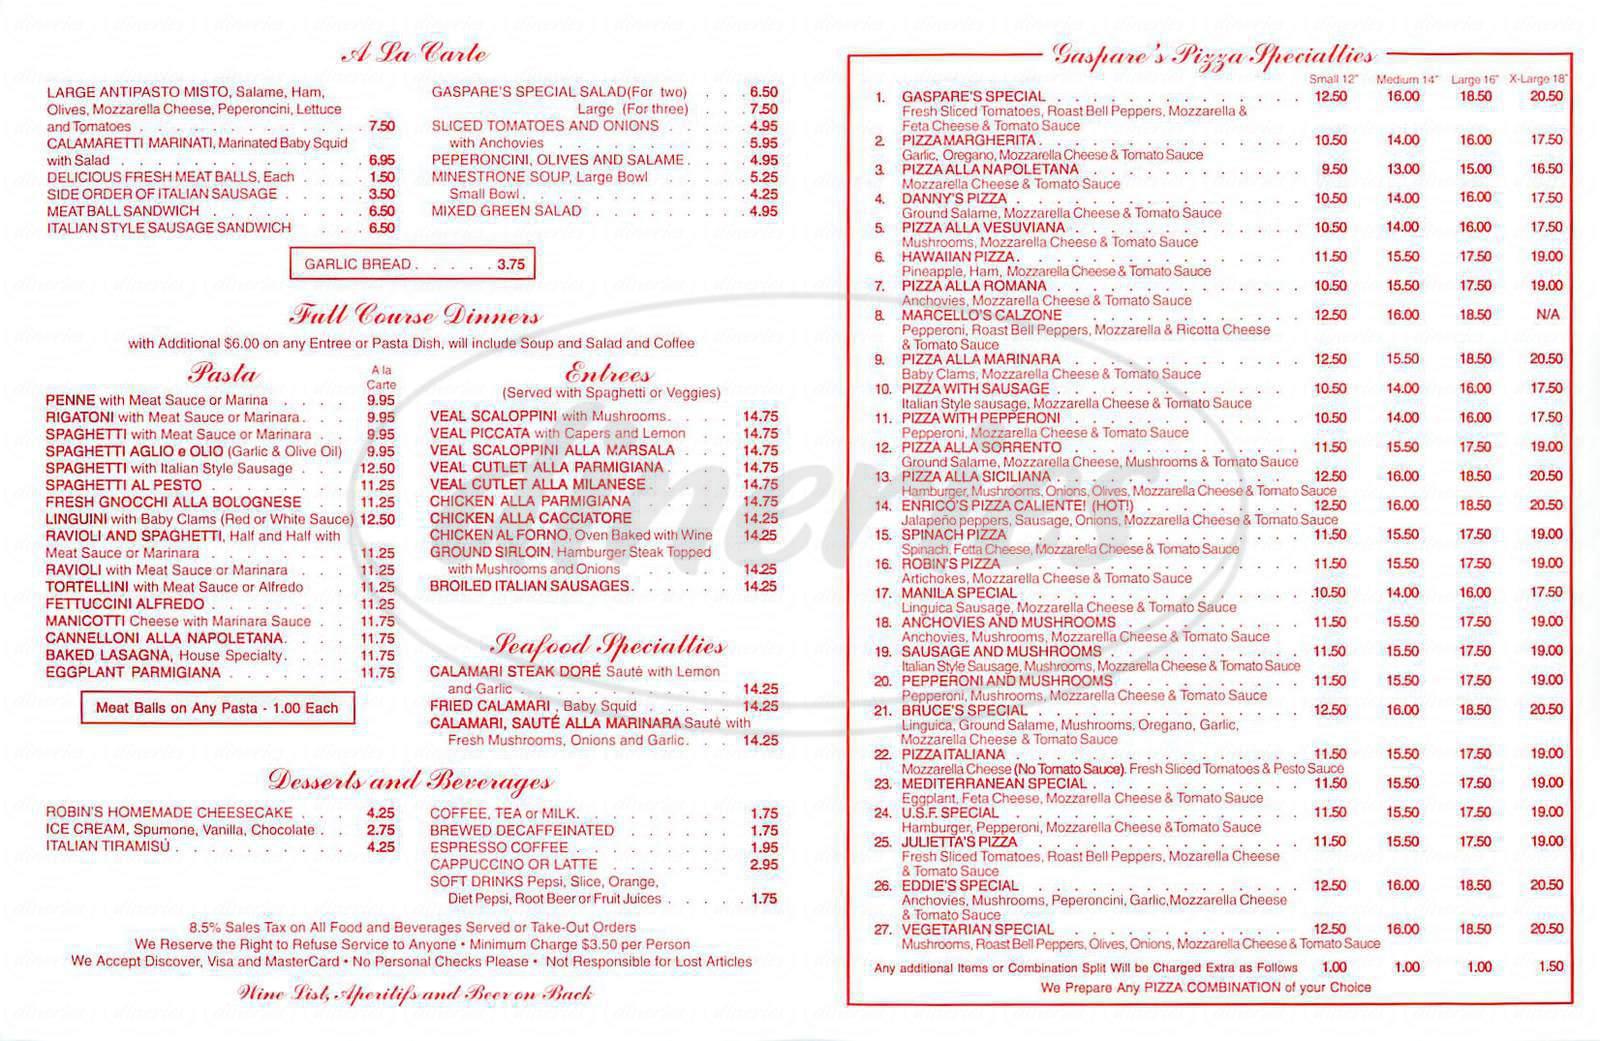 menu for Gaspare's